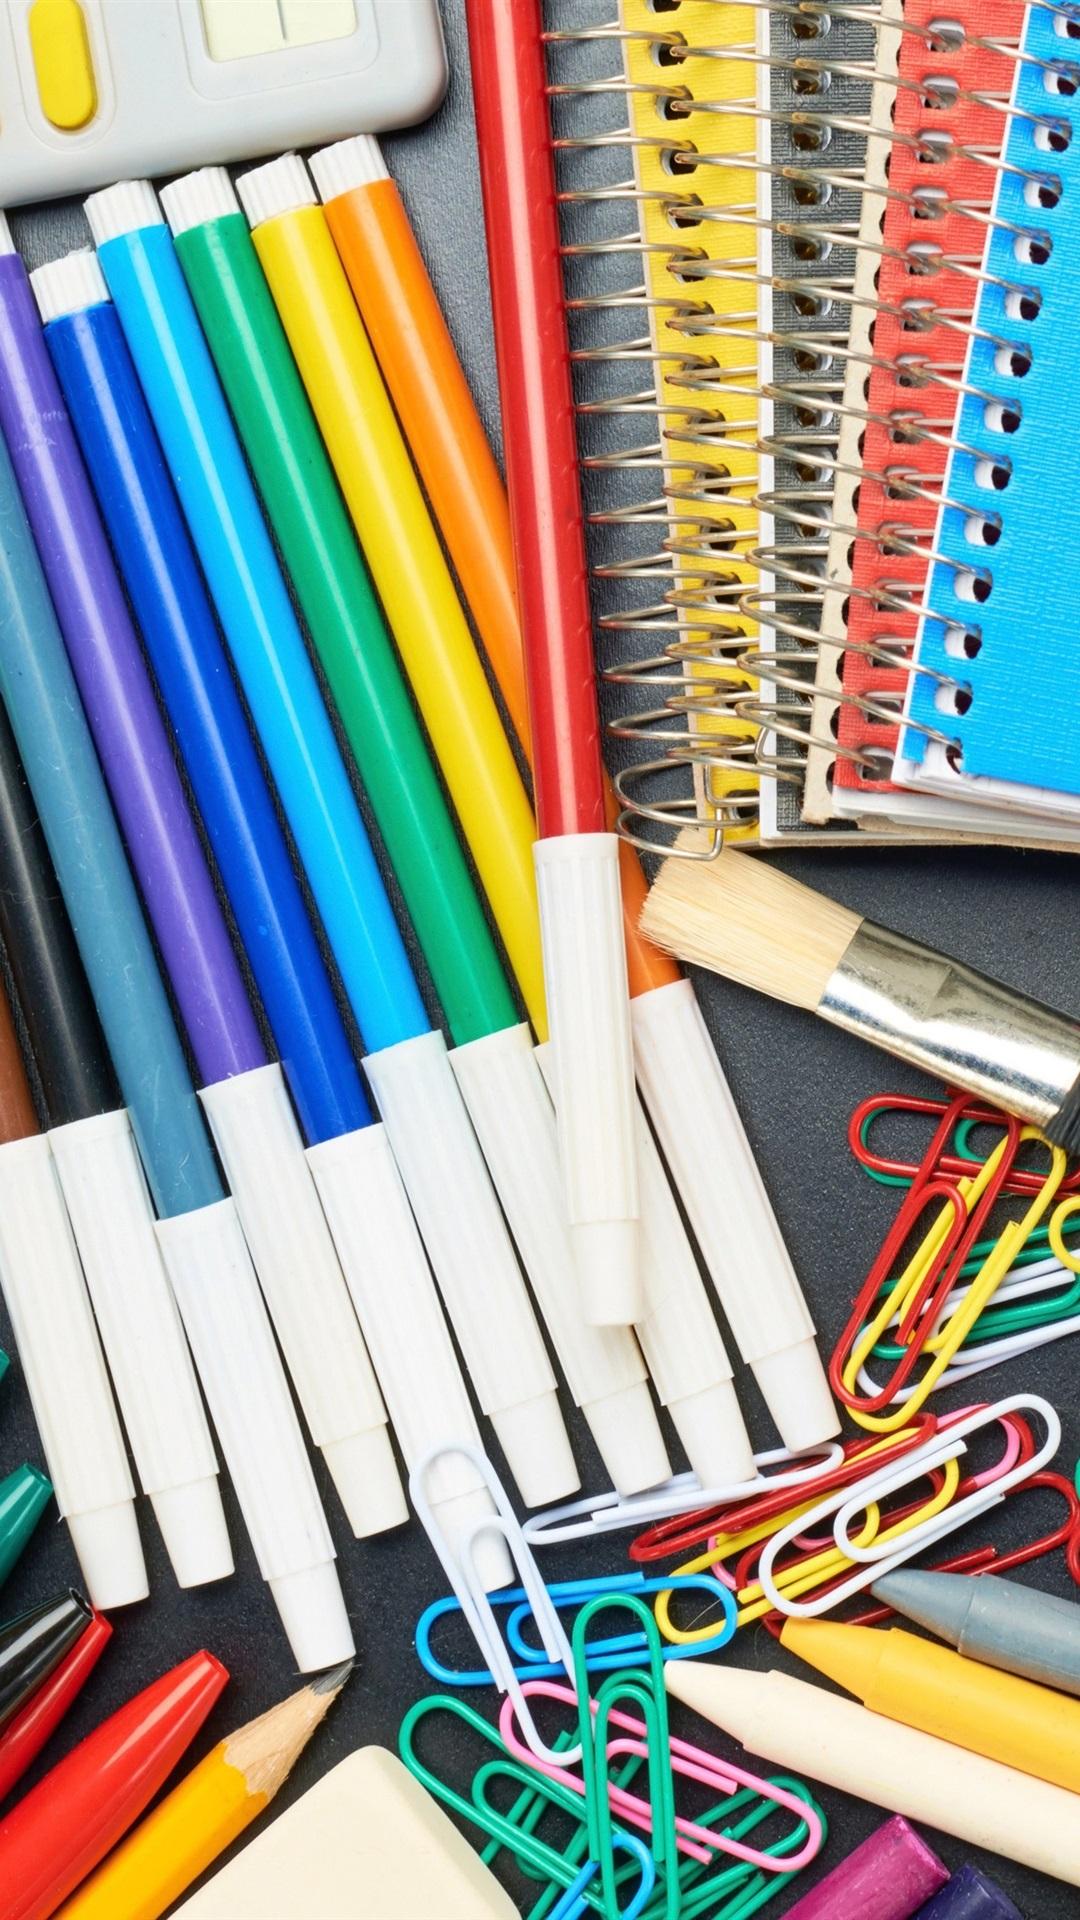 Colorful Pencils Brush Scissors Notebook Calculator